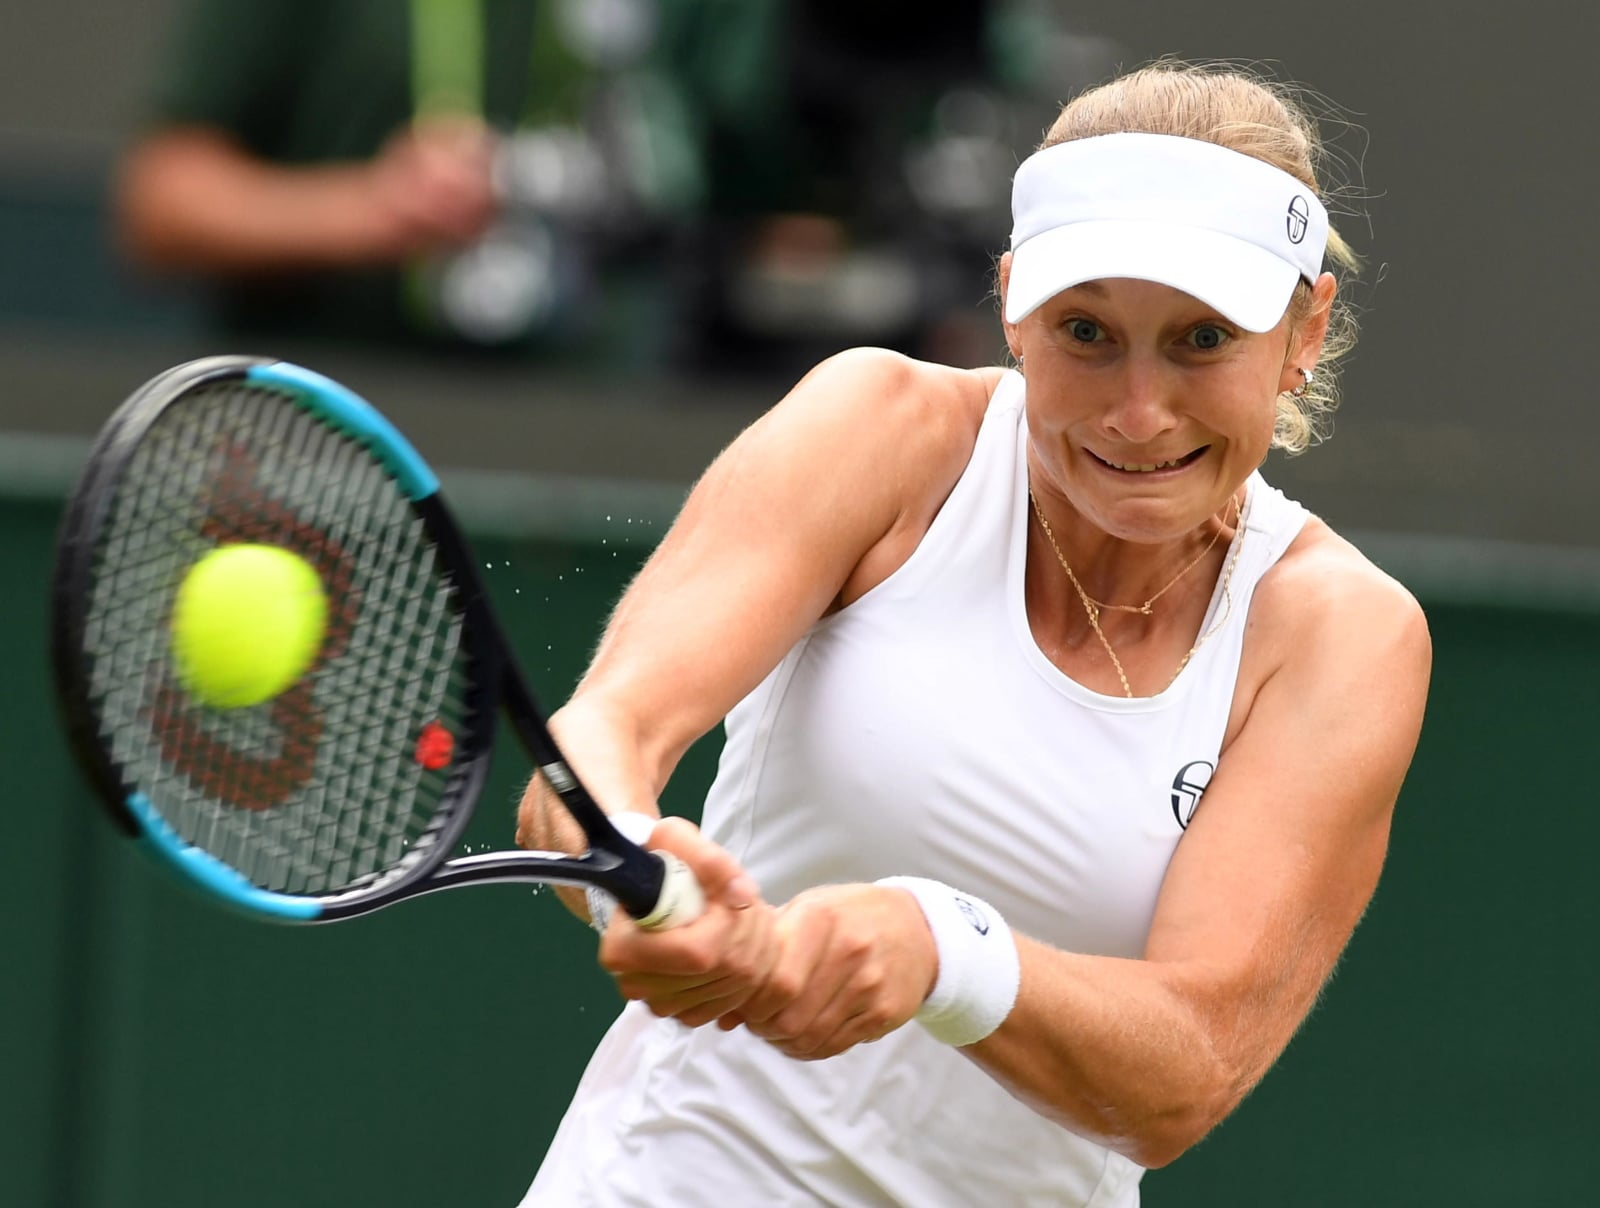 Wimbledon EPA/GERRY PENNY